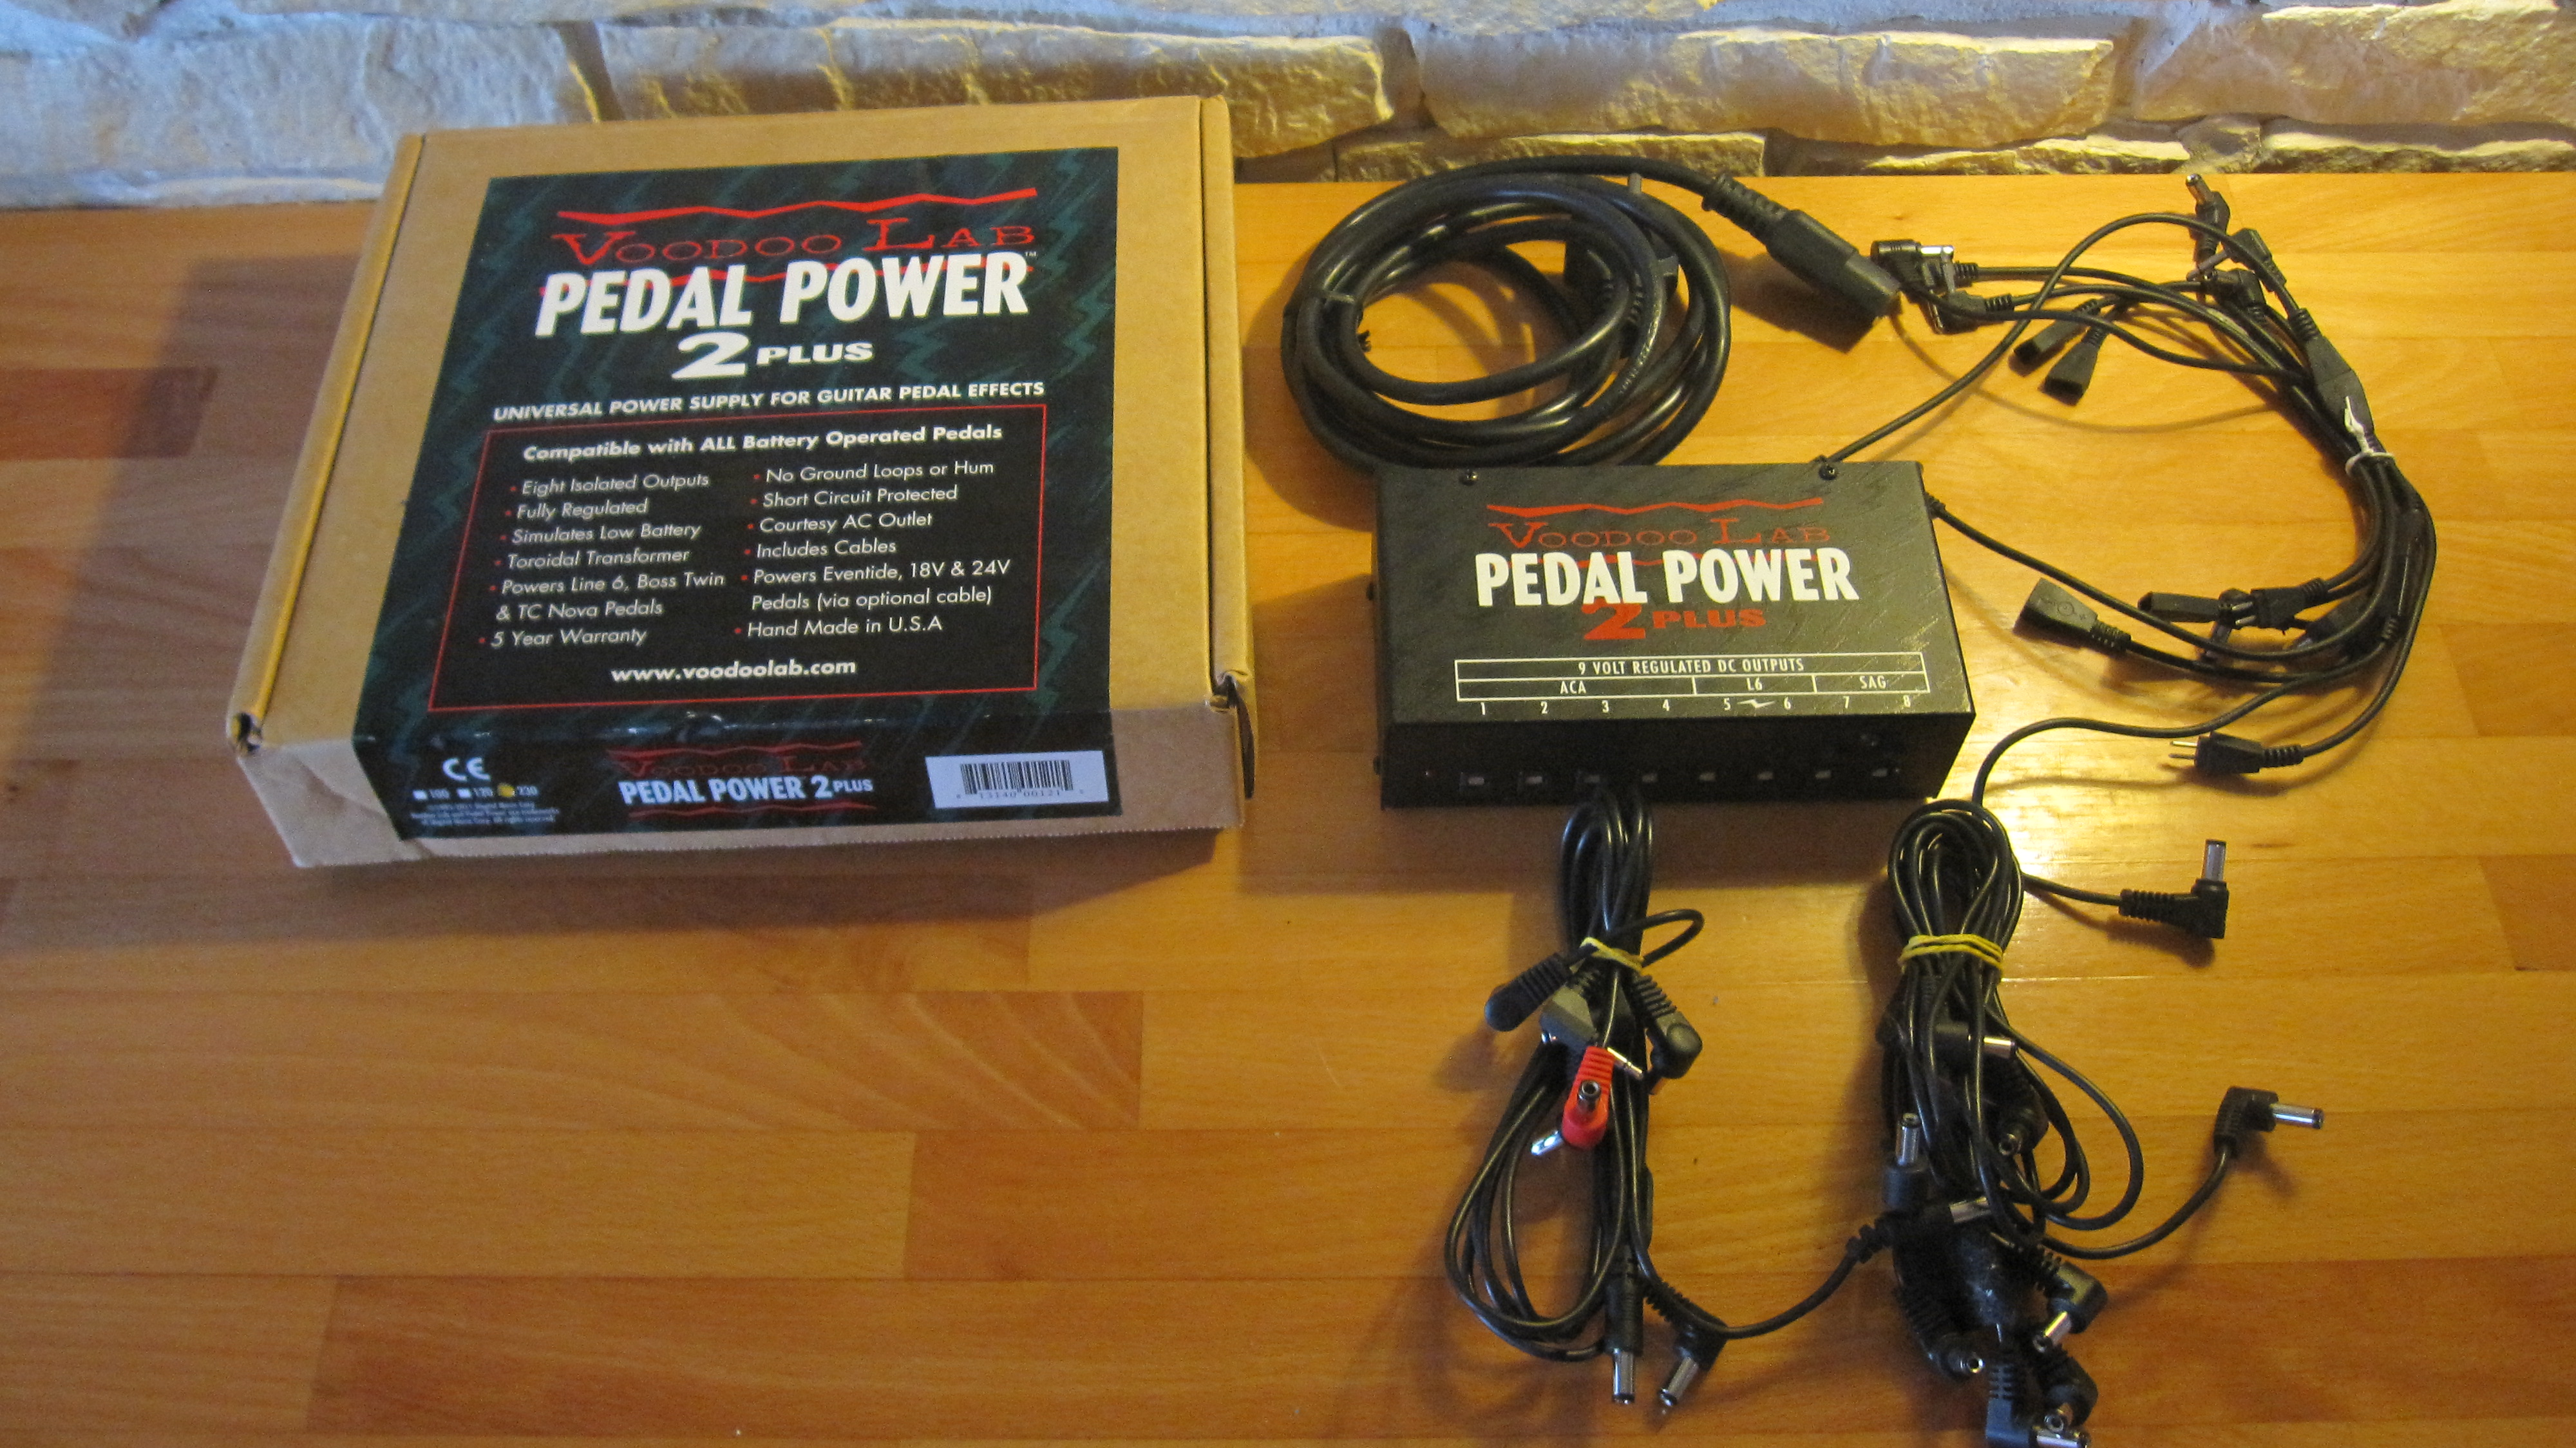 voodoo lab pedal power 2 plus image 901037 audiofanzine. Black Bedroom Furniture Sets. Home Design Ideas